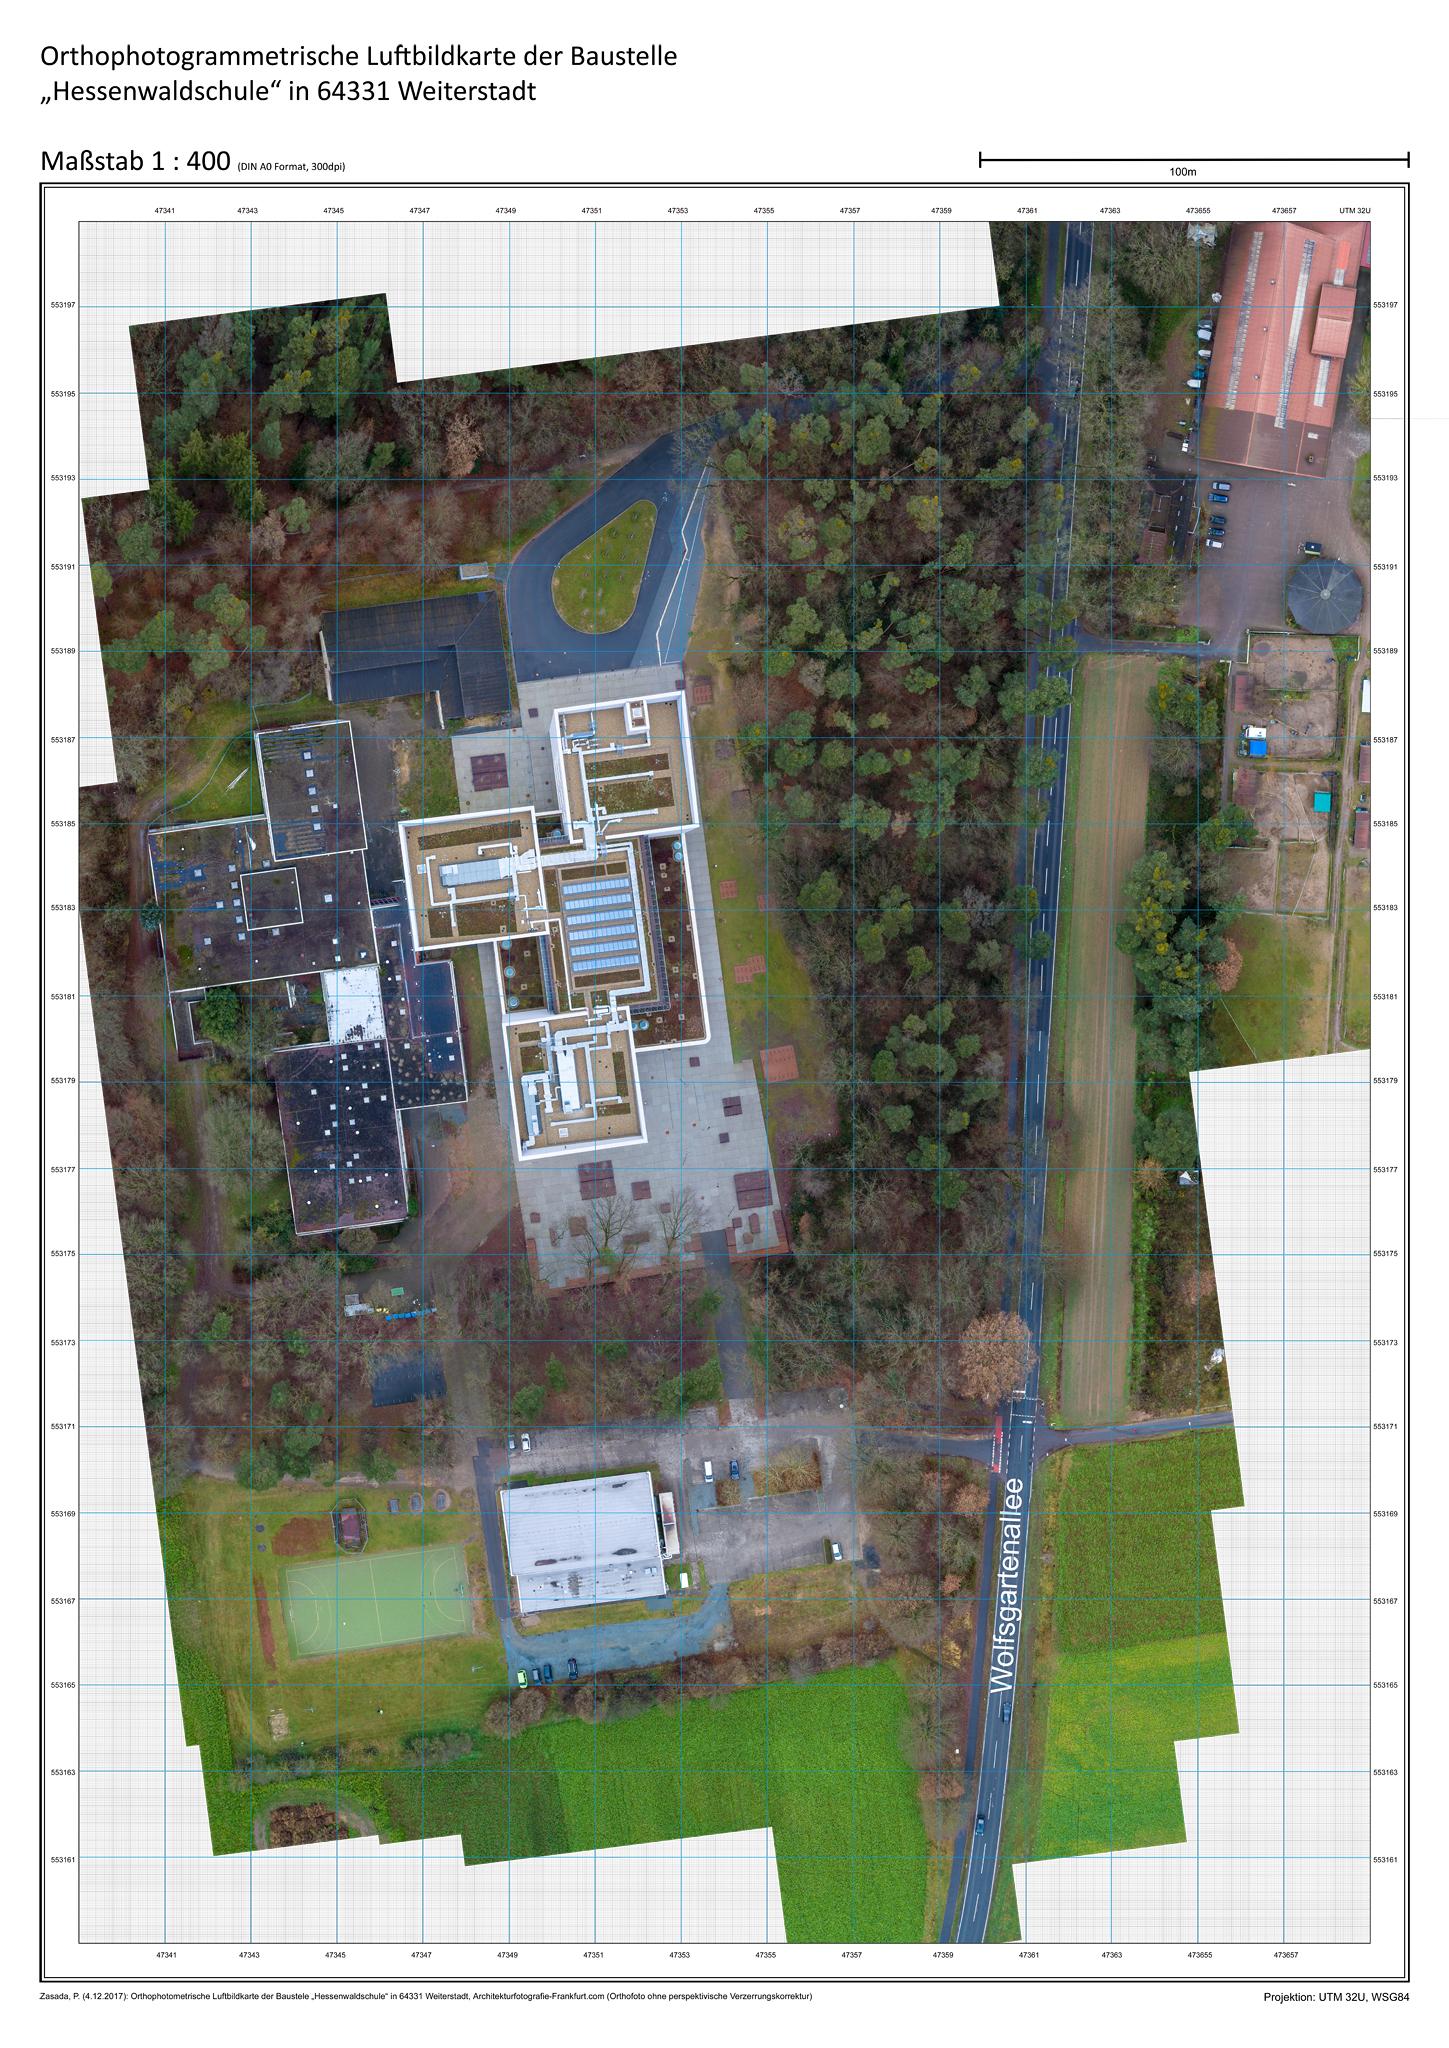 Photogrammetrie Luftbildaufnahme Gewerbeimmobilie Fotos